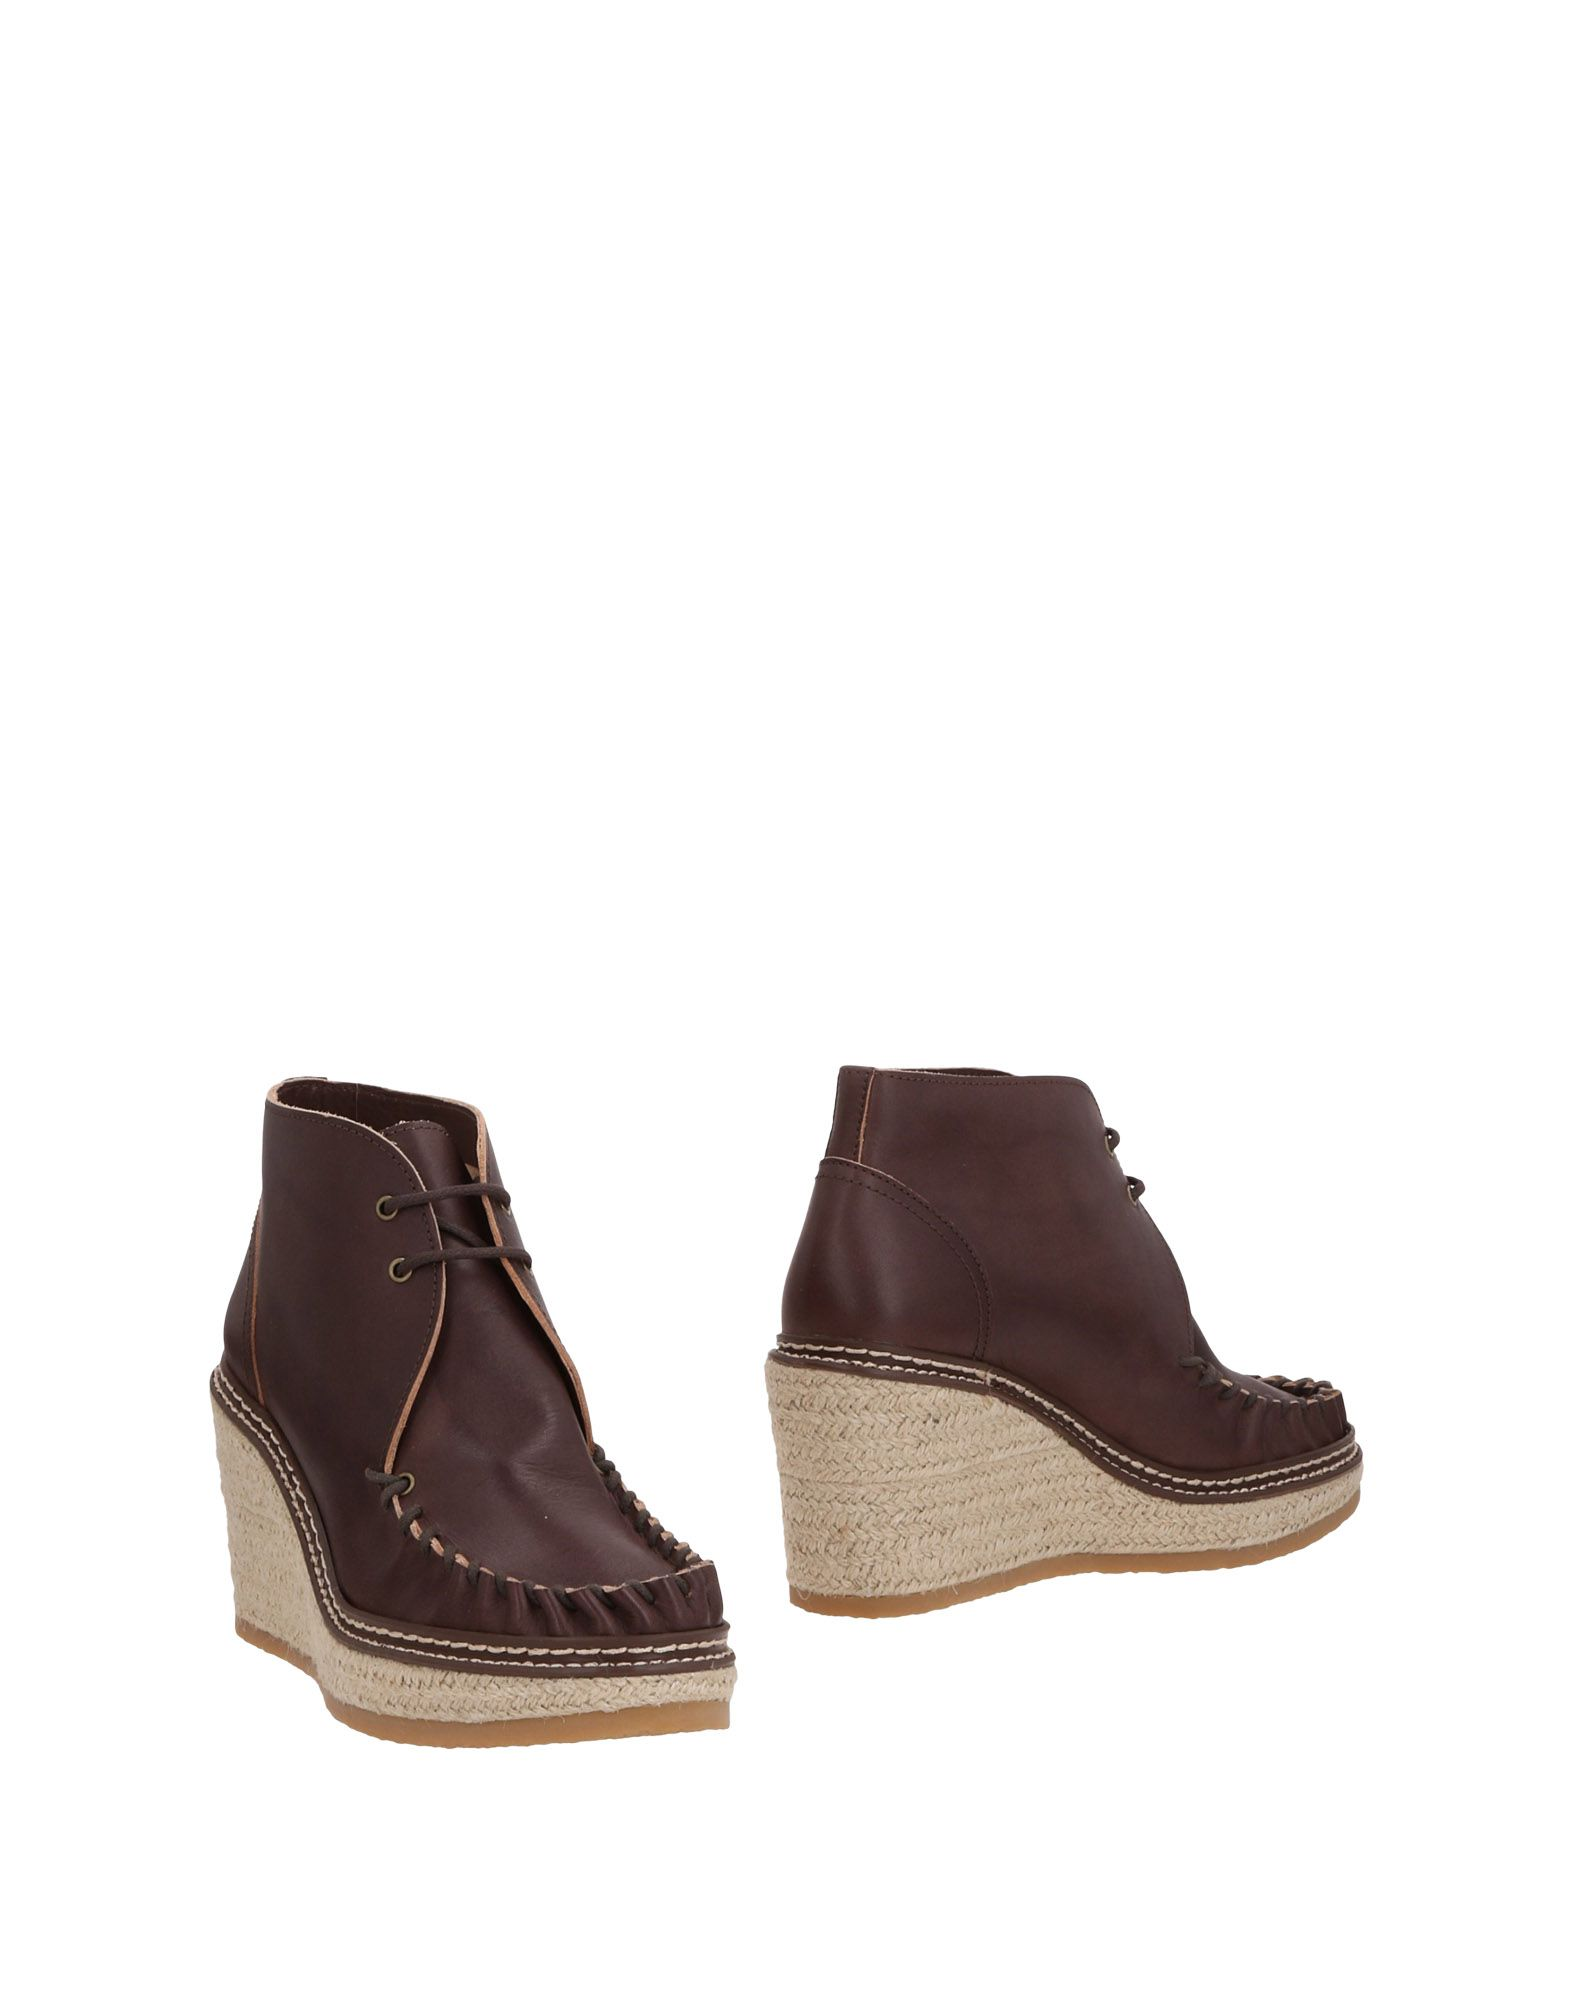 Rabatt Stiefelette Schuhe See By Chloé Stiefelette Rabatt Damen  11462436SD f67468